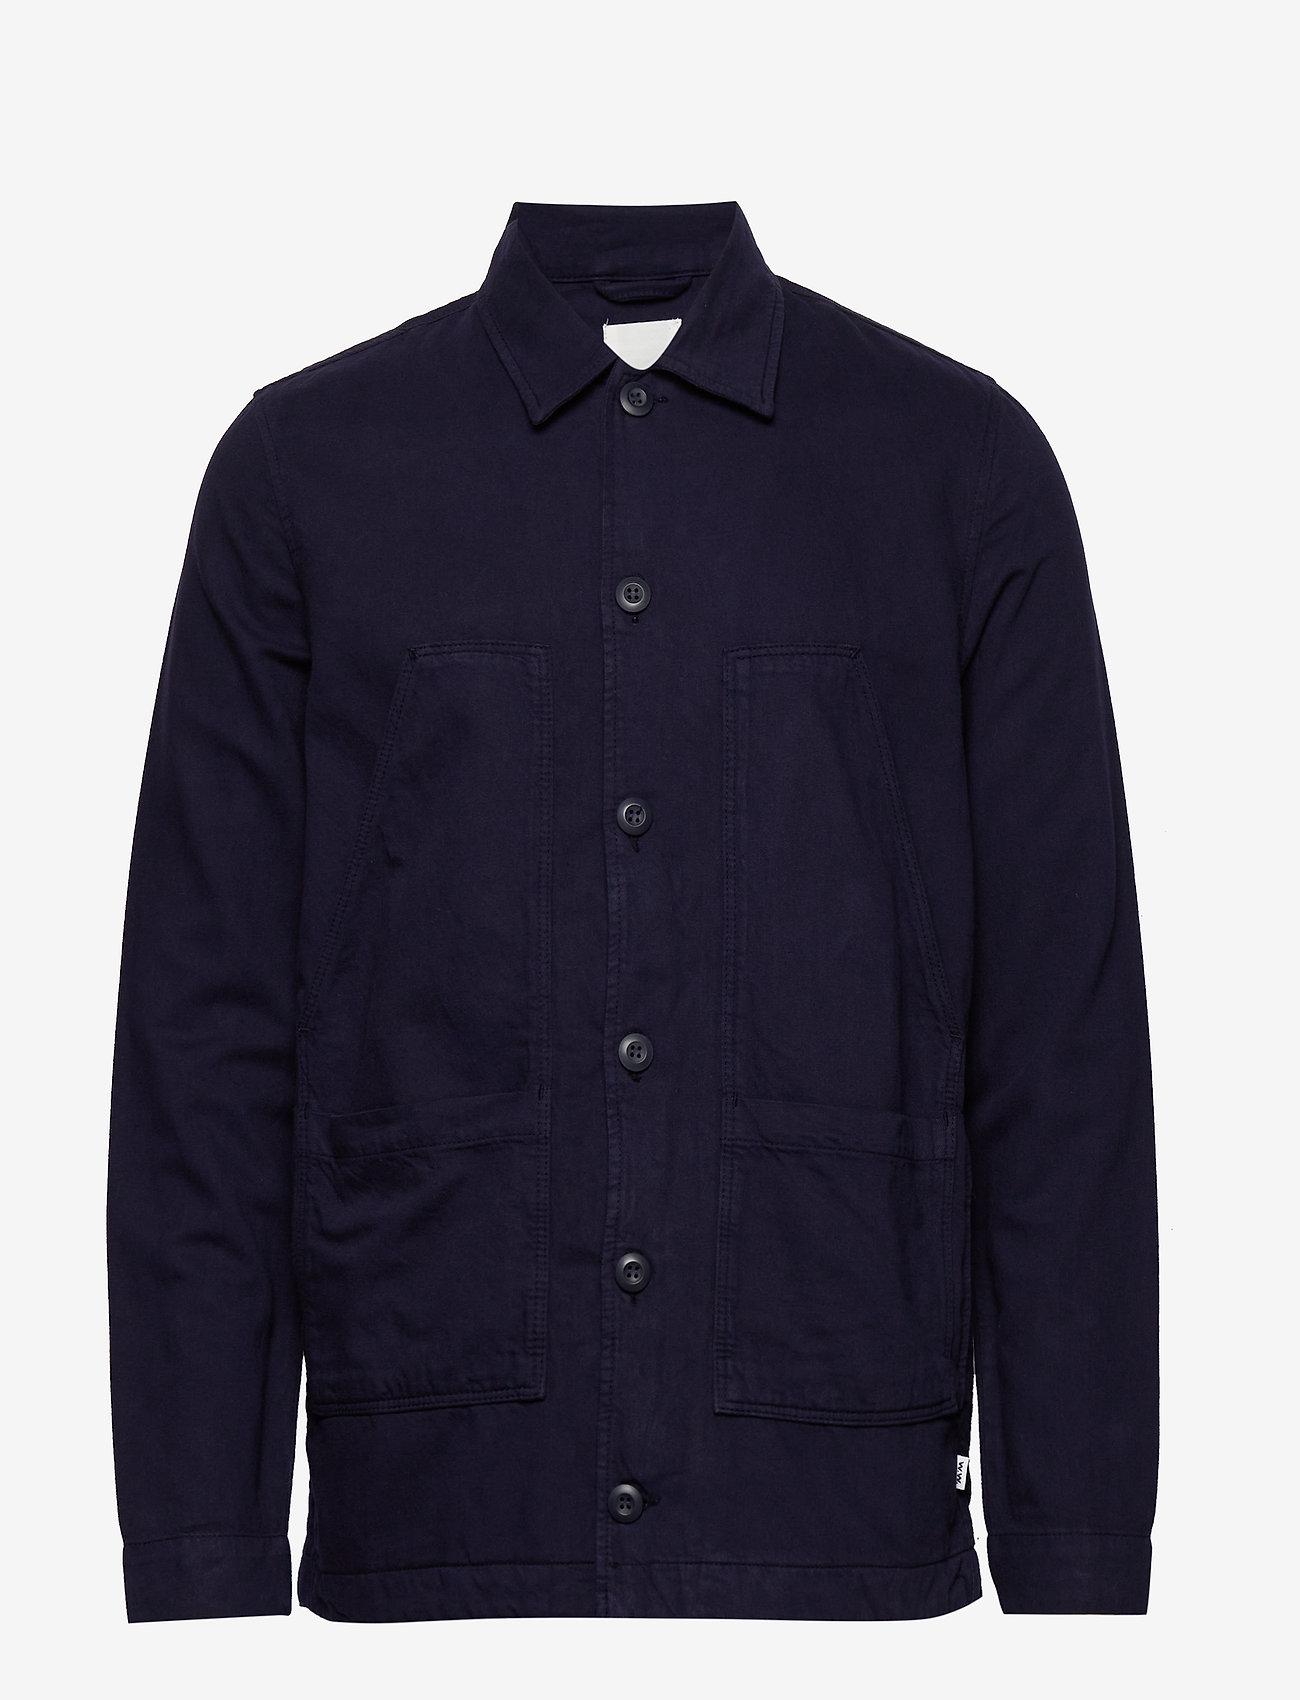 Wood Wood - Fabian shirt - overshirts - navy - 0